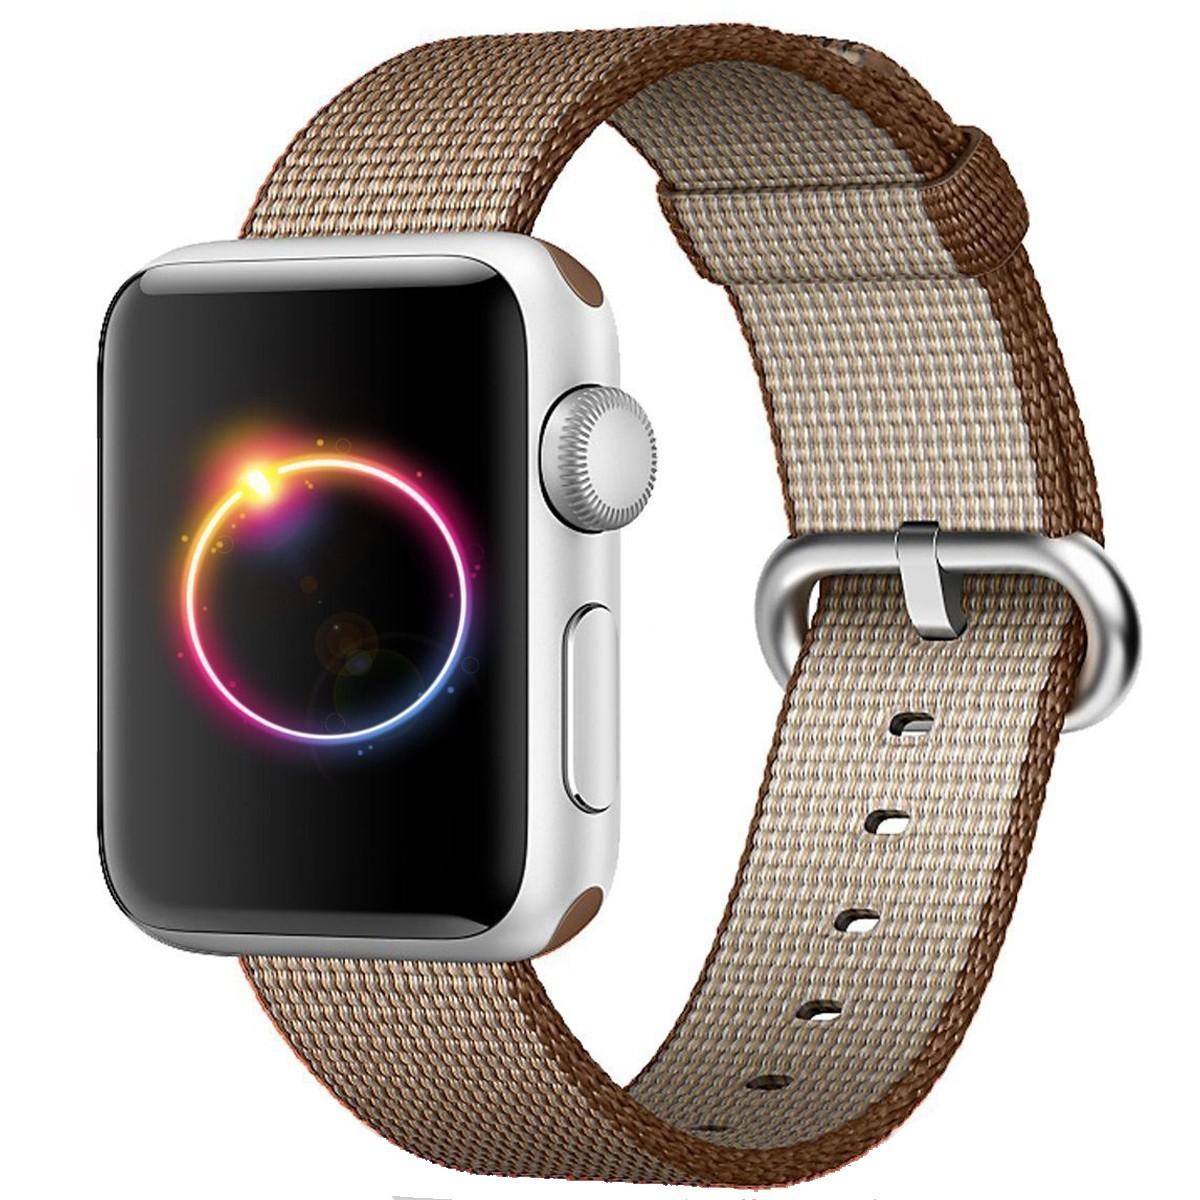 Curea pentru Apple Watch 42 mm iUni Woven Strap, Nylon, Brown